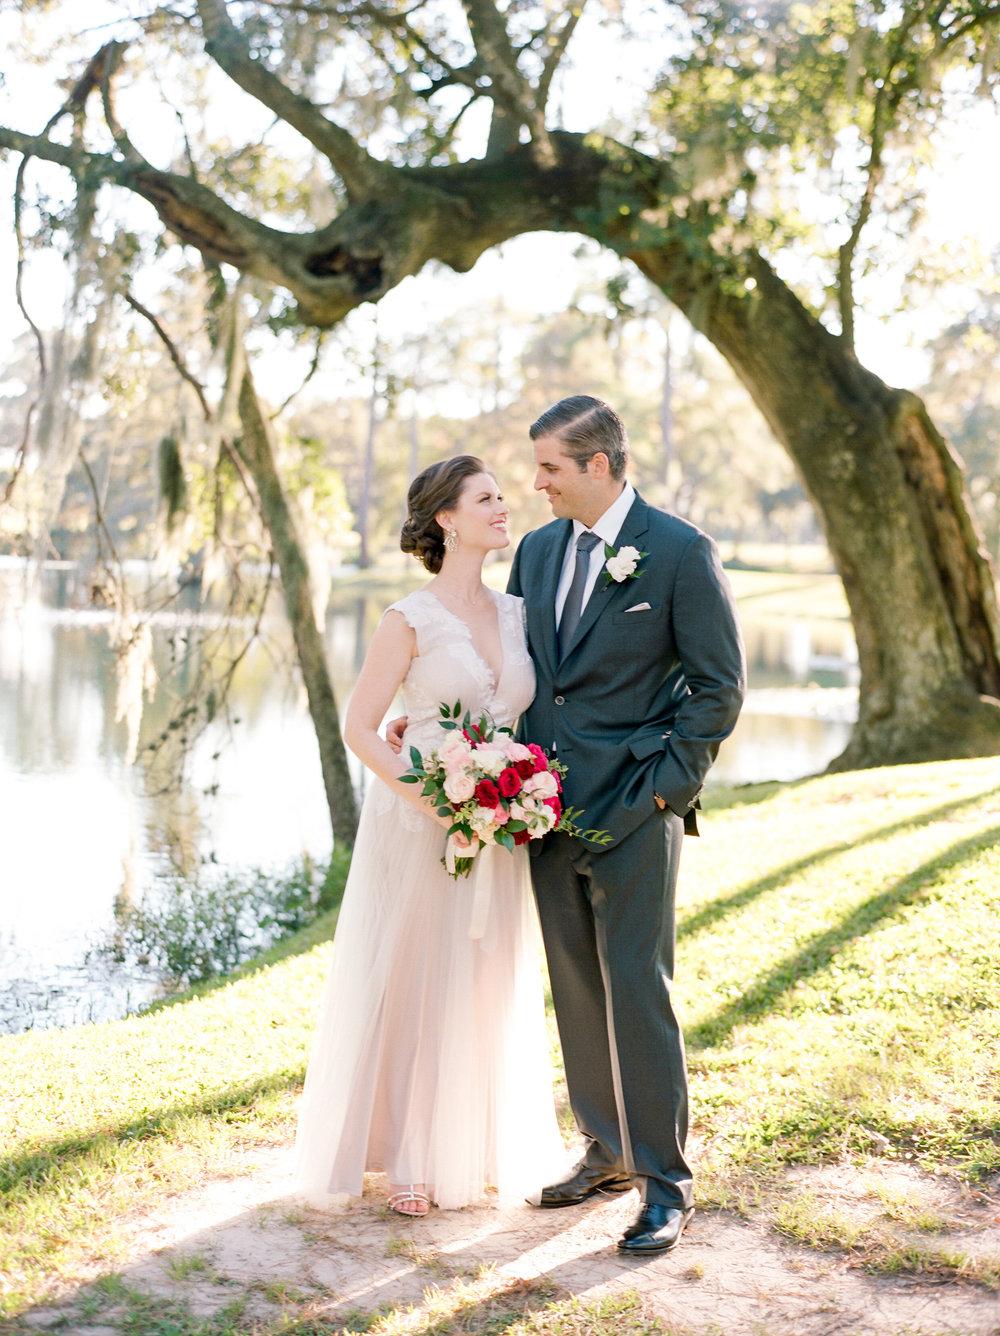 Houston-Wedding-Photographer-Lakeside-Country-Club-First-Look-Bride-Groom-Formals-Film-Fine-Art-Photography-23.jpg